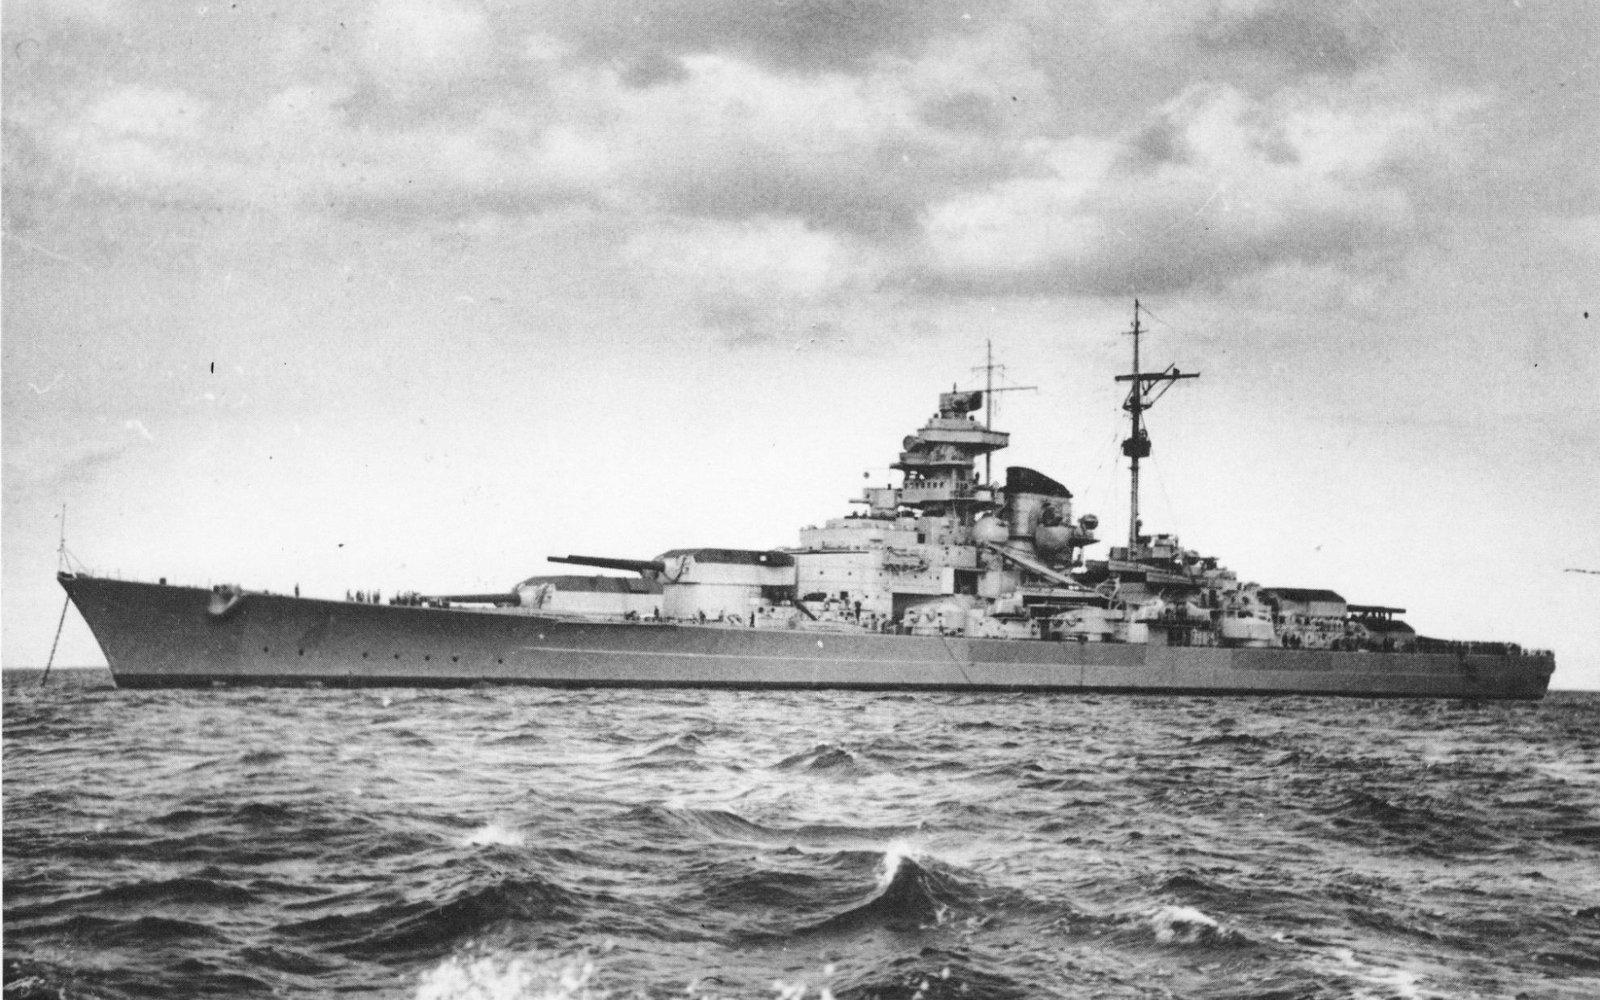 German Battleship Tirpitz. The fate of the battleship Tirpitz 52